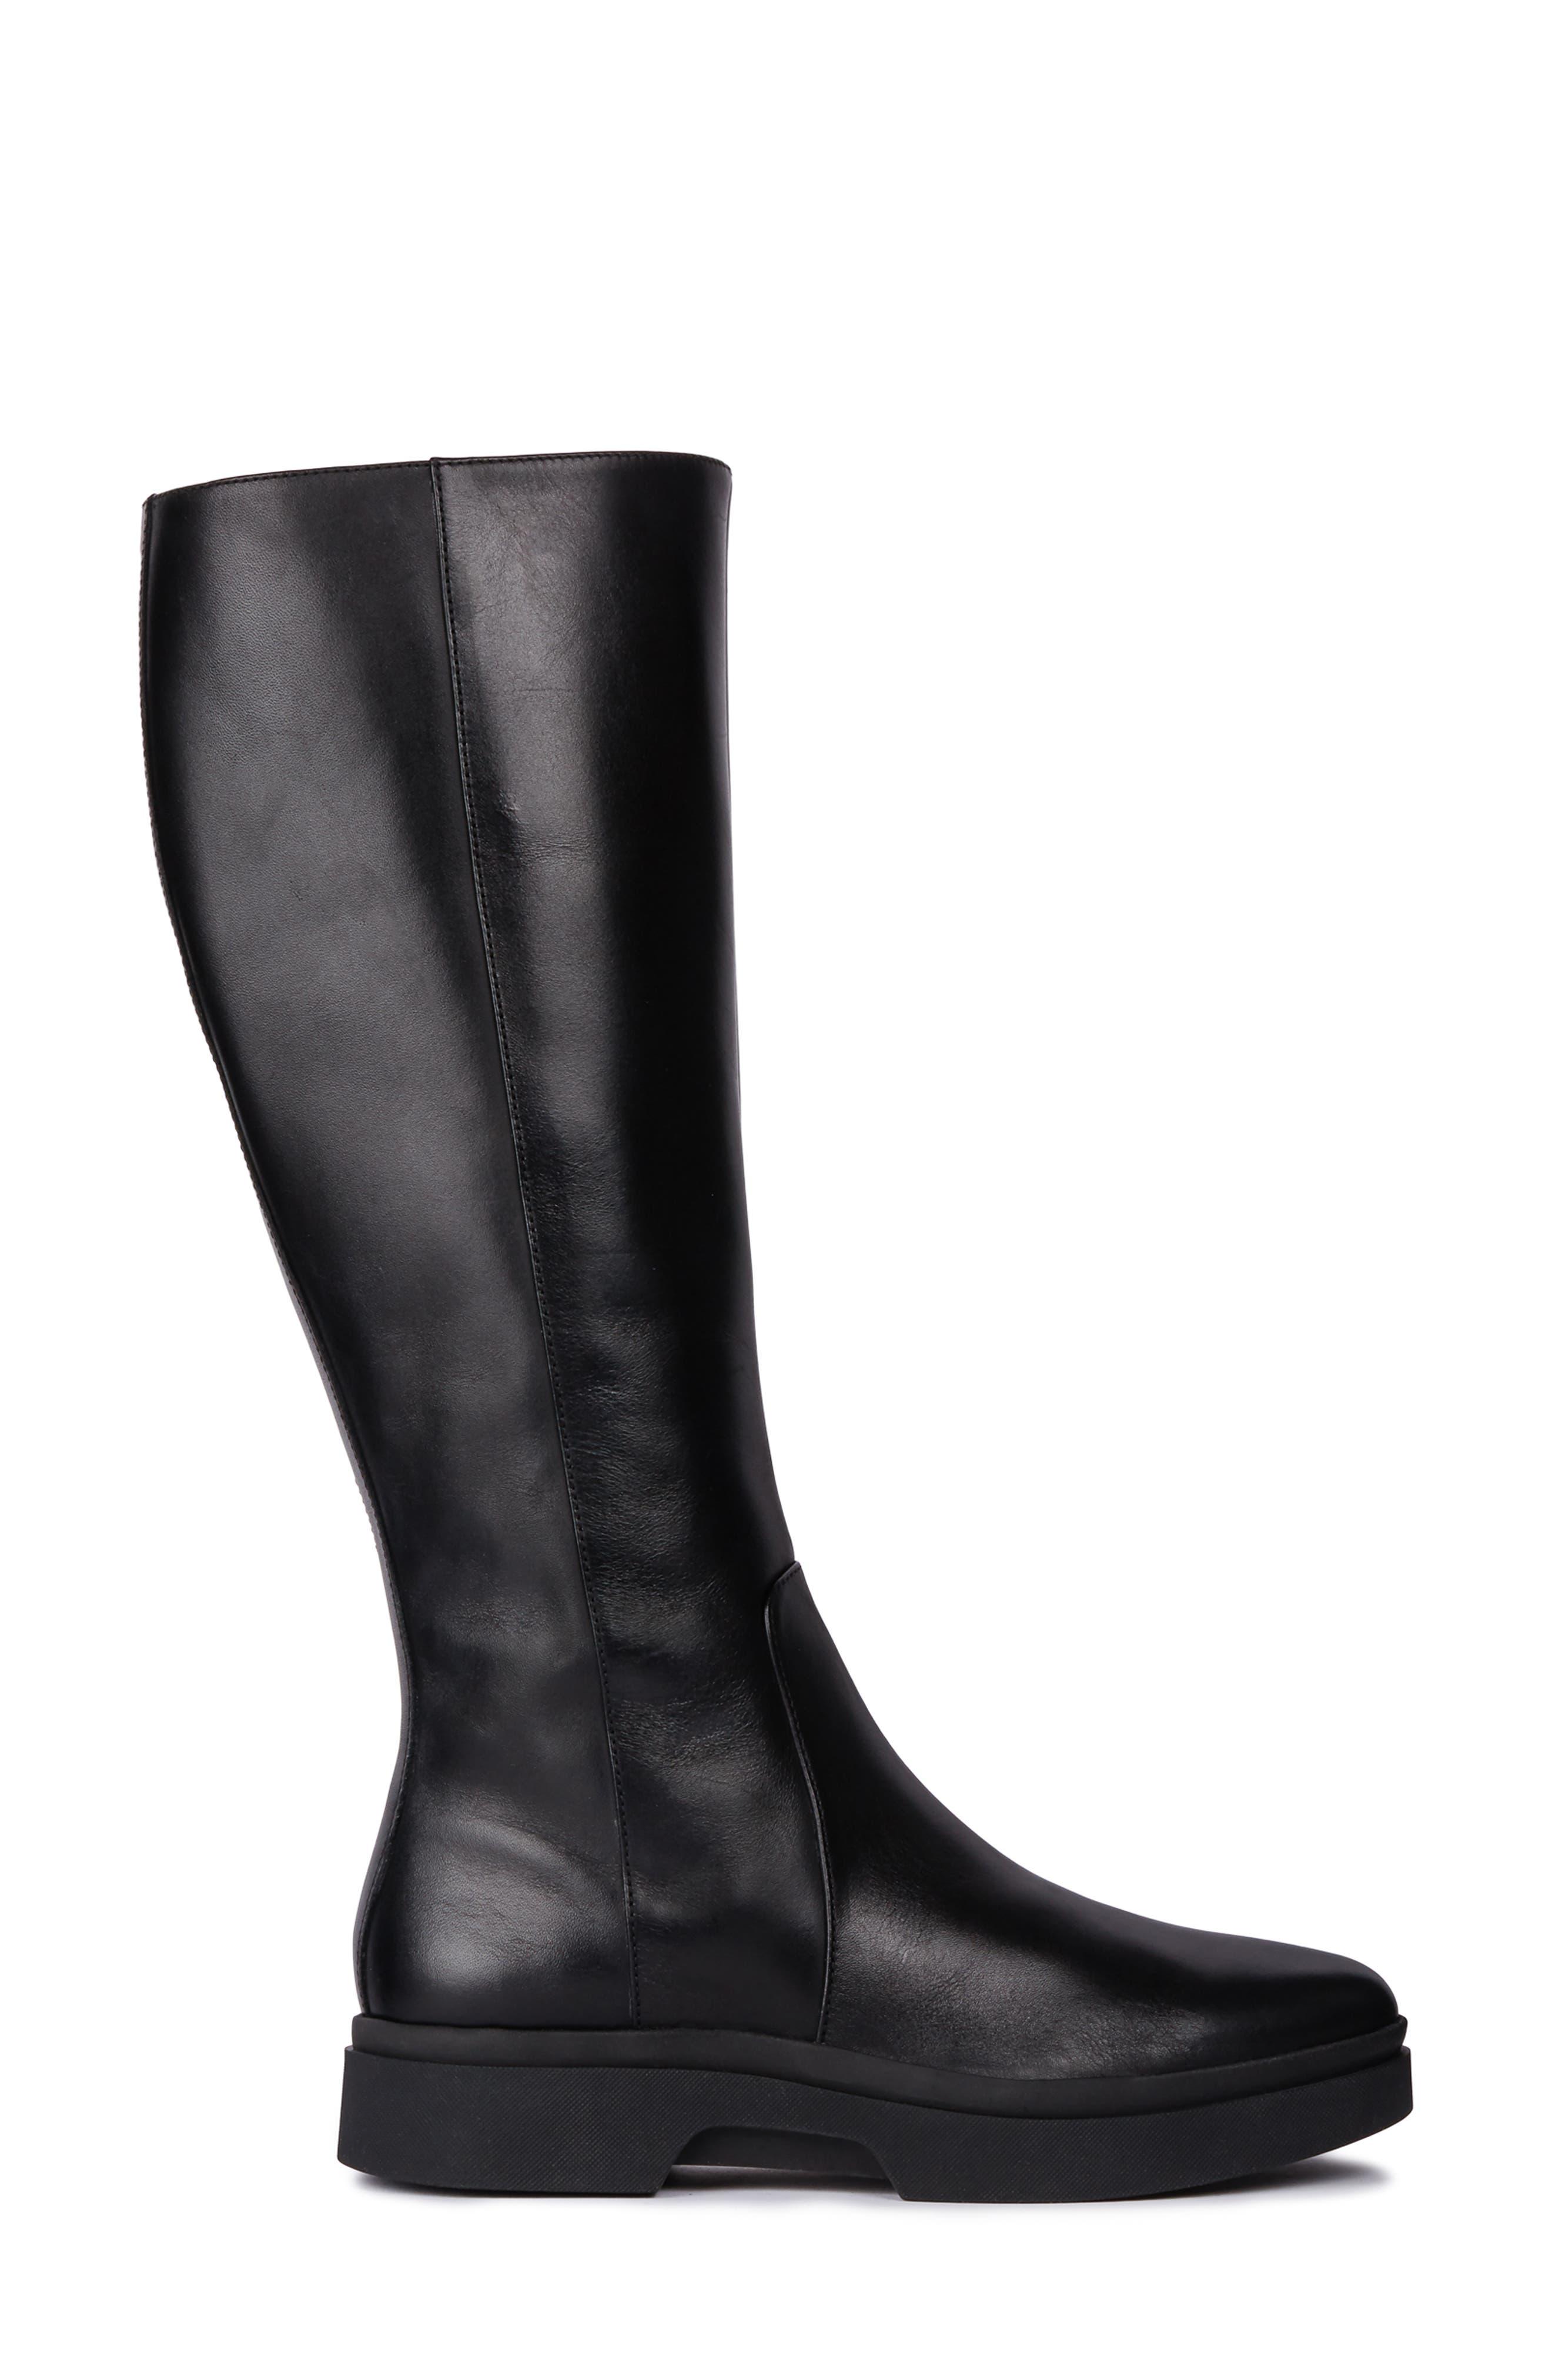 Myluse Knee High Platform Boot,                             Alternate thumbnail 3, color,                             BLACK LEATHER